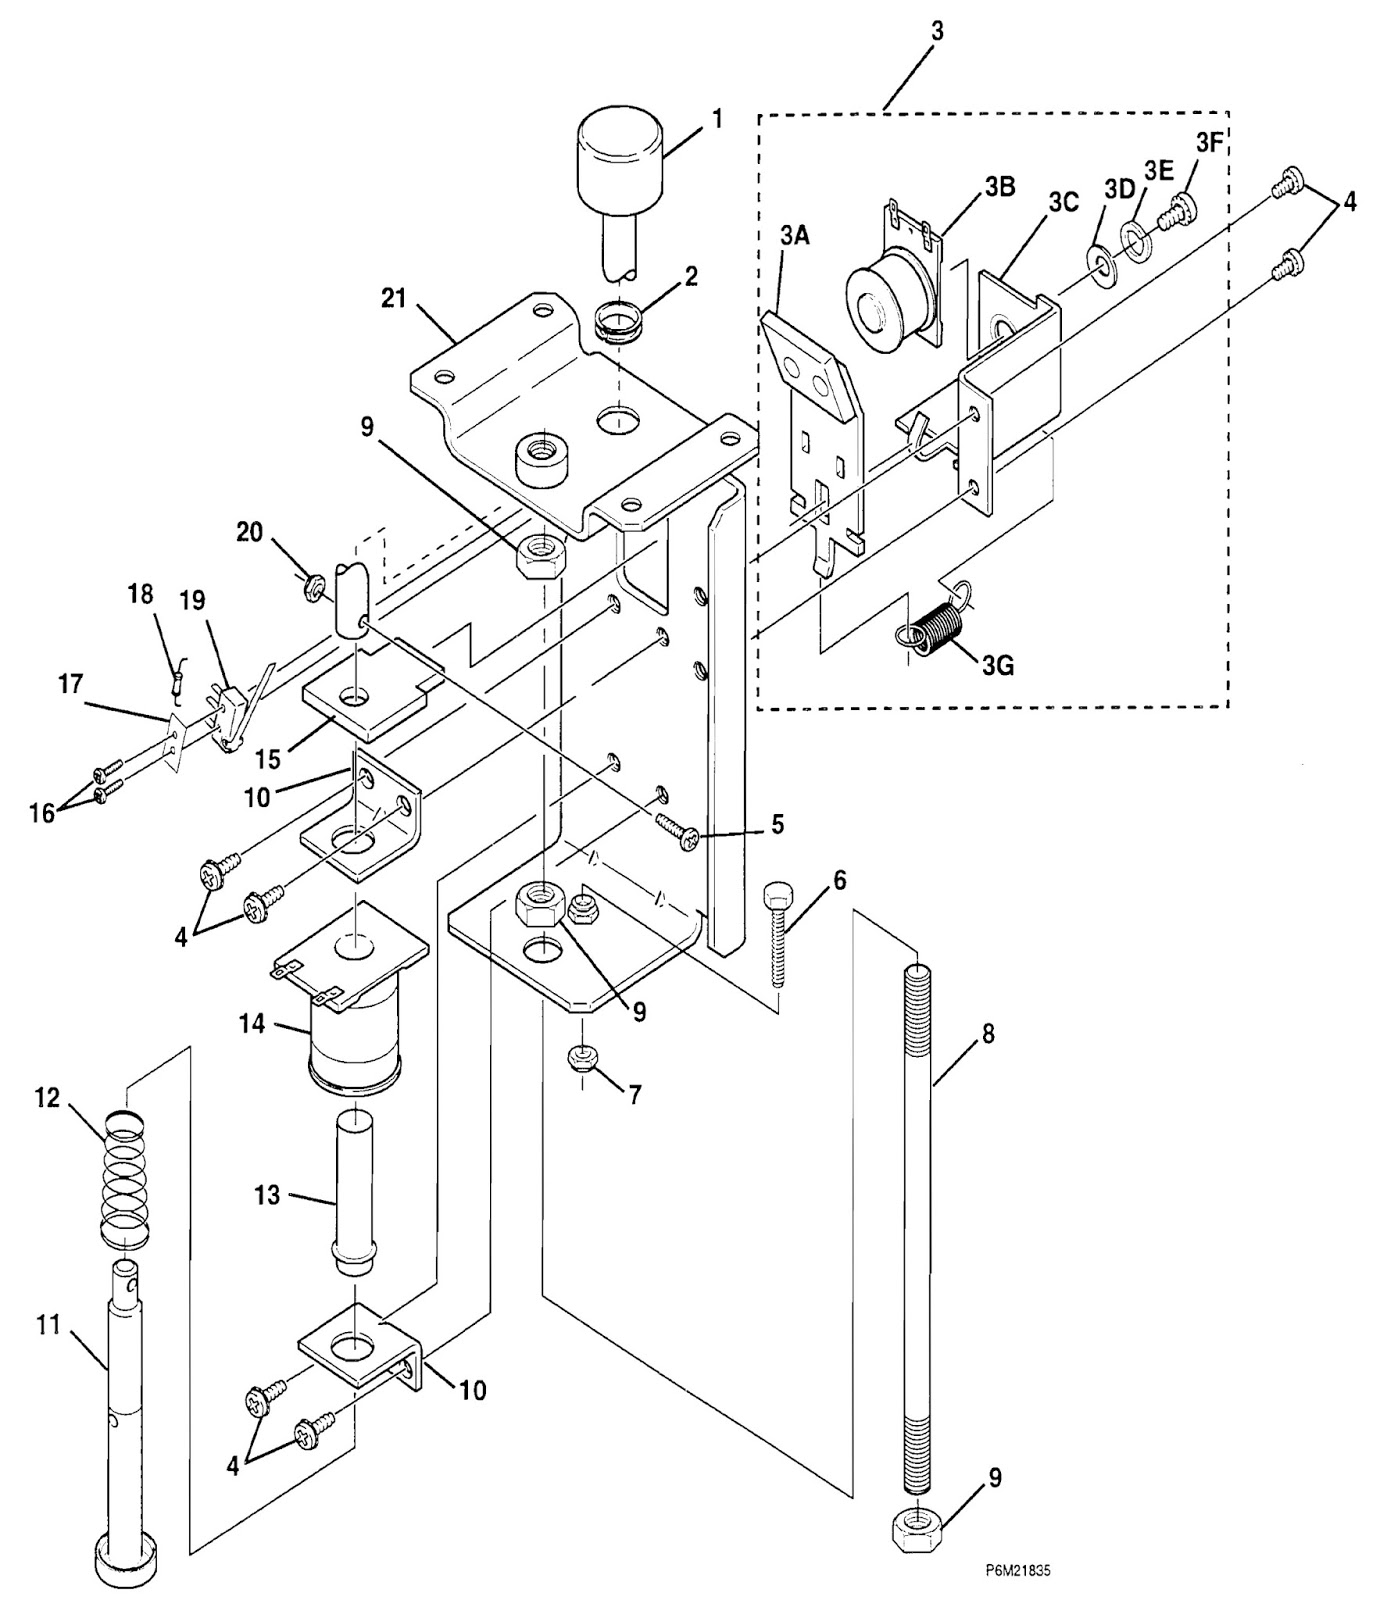 Diagram Of A Pinball Machine | Wiring Diagram Database on pinball playfield, pinball disassembly, pinball artwork, pinball tables, pinball sketches, pinball illustrations, pinball dimensions, pinball company, pinball wiring, pinball plans, pinball parts, pinball books,